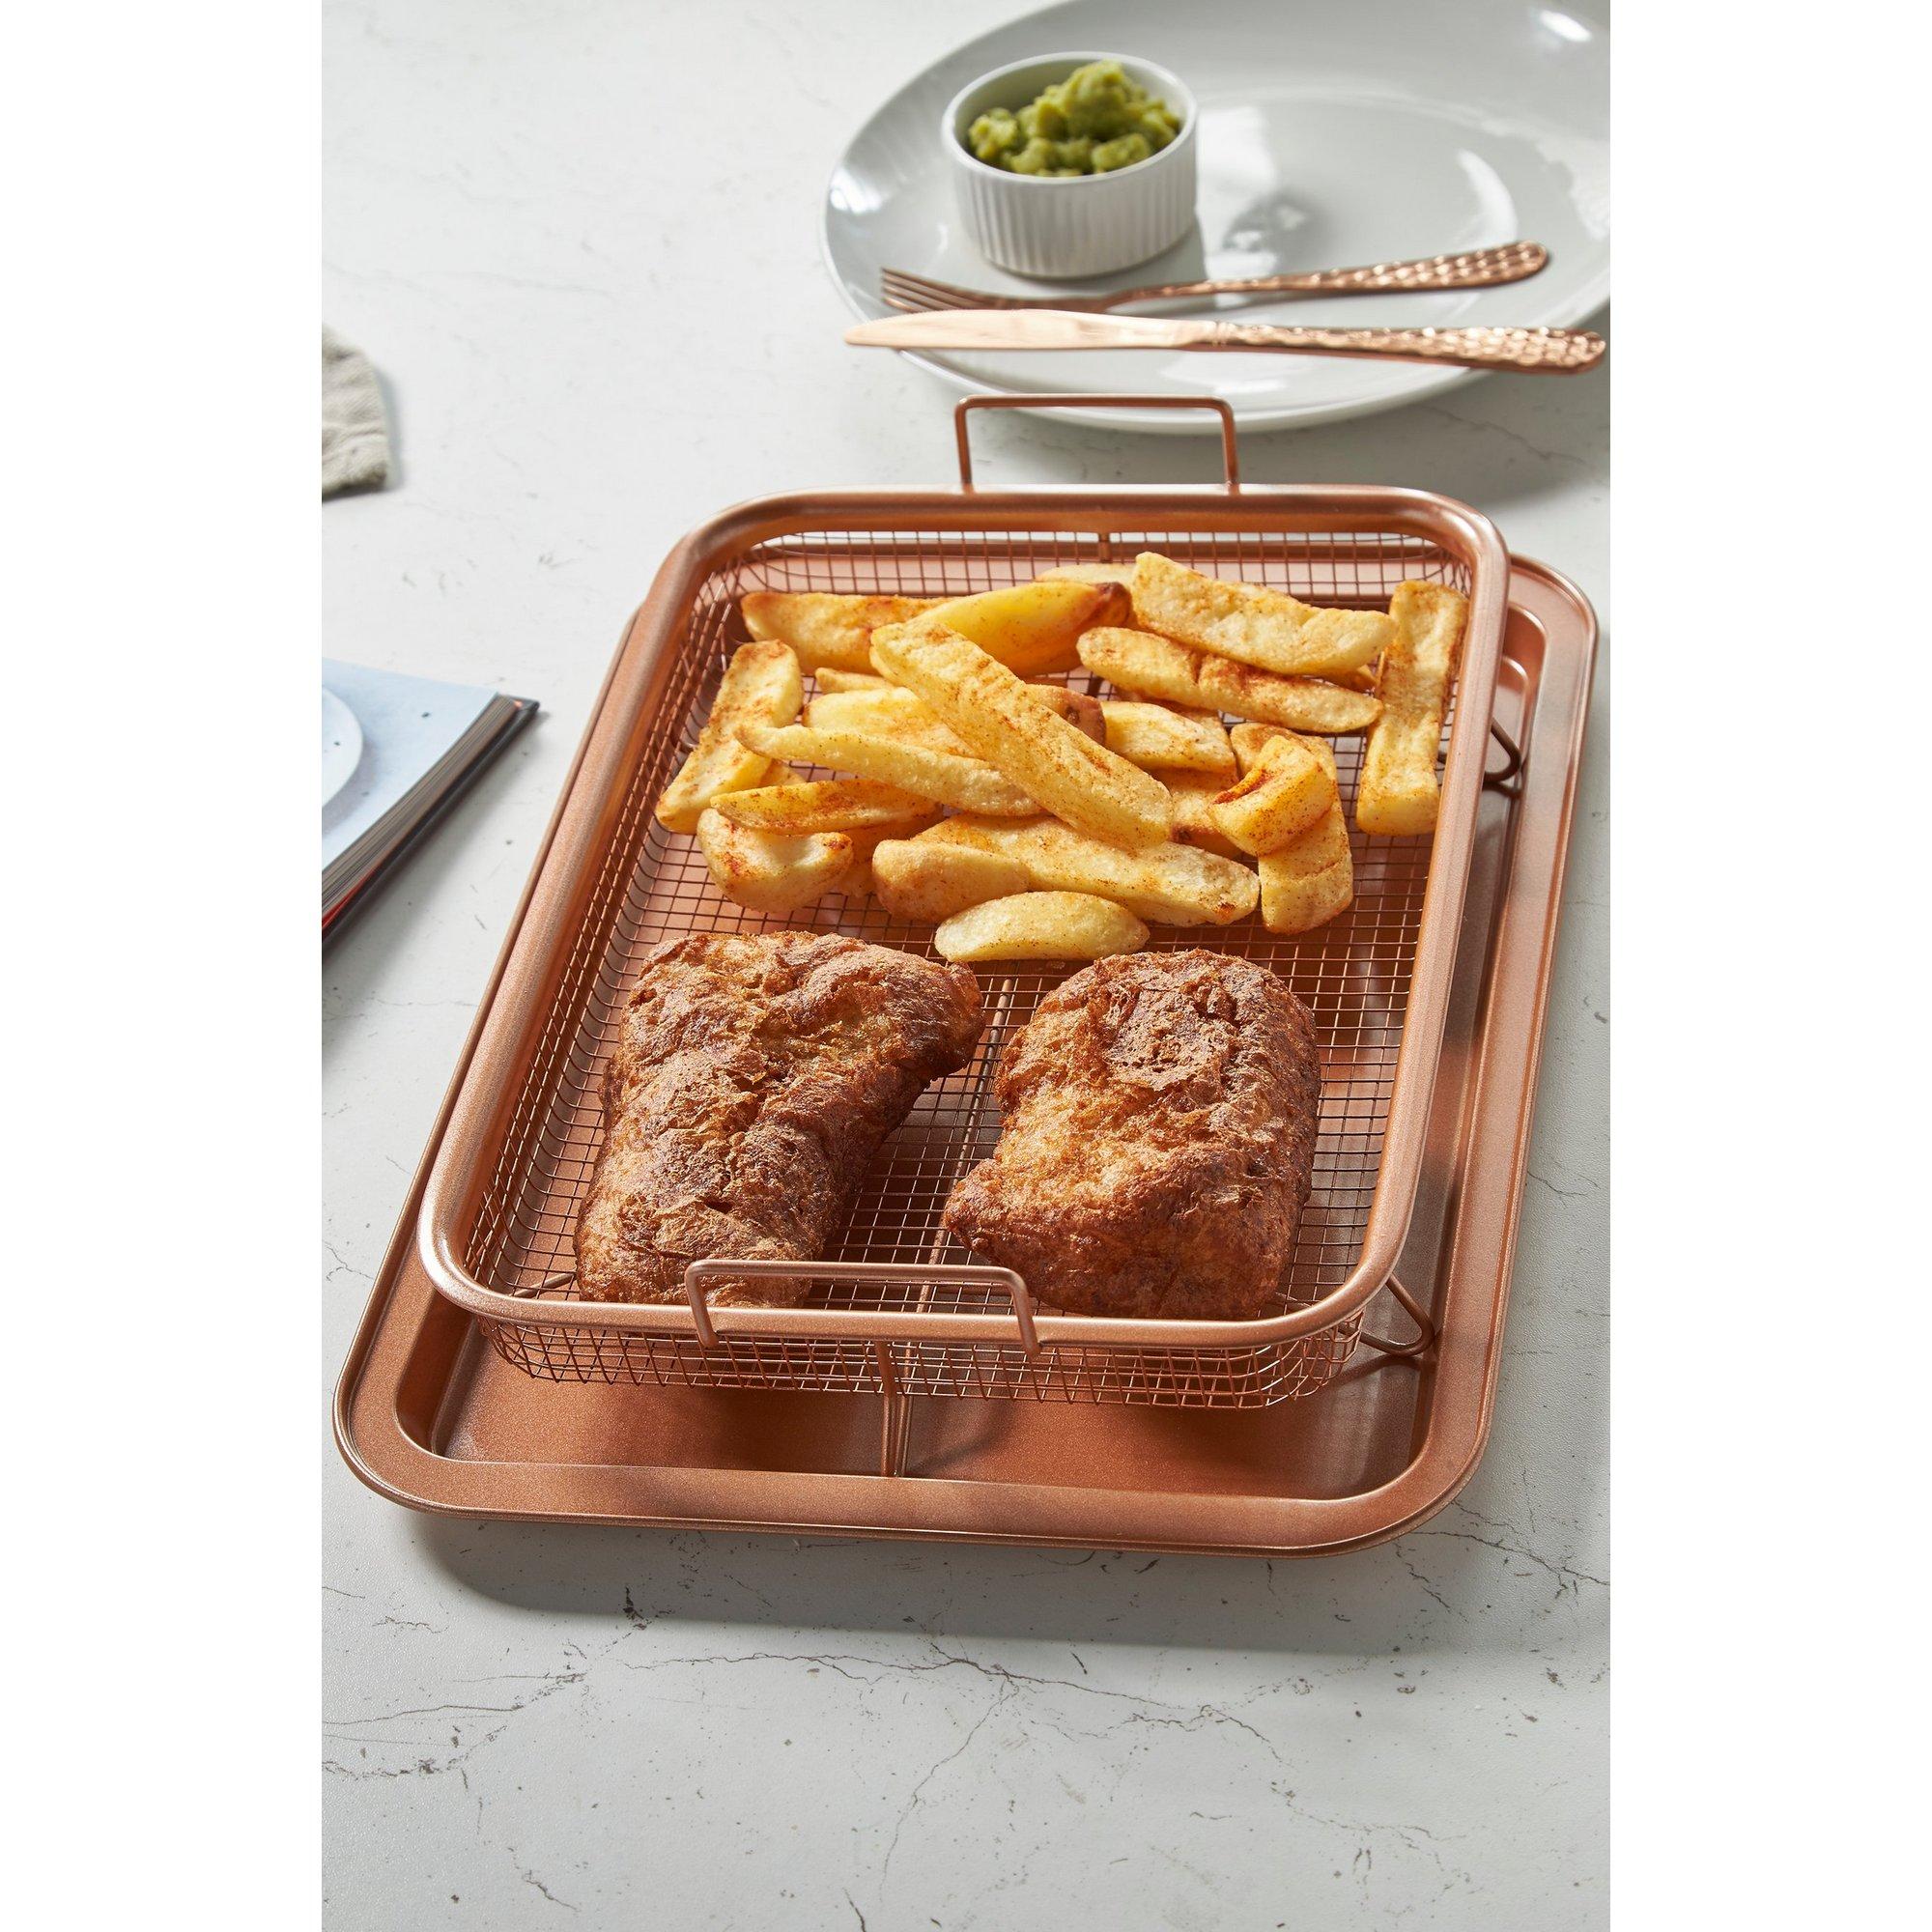 Image of Family Size Copper Cook Crisper Tray